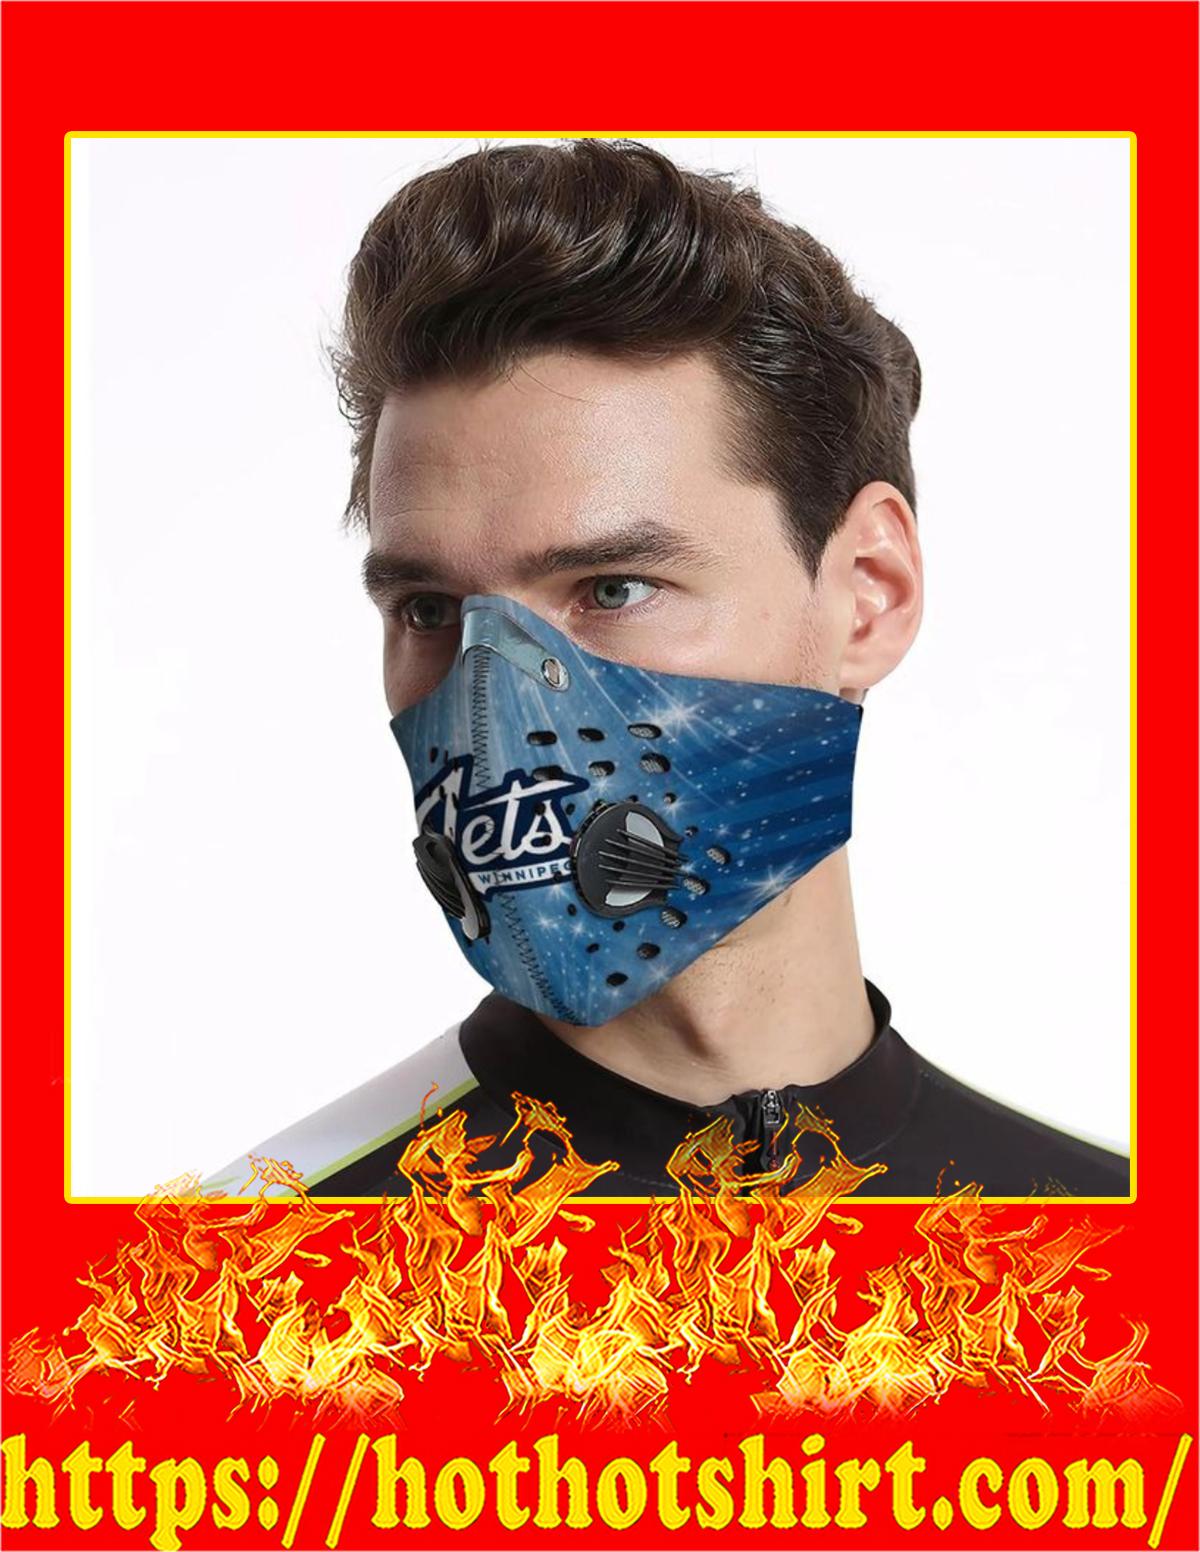 Winnipeg jets filter face mask - Pic 1